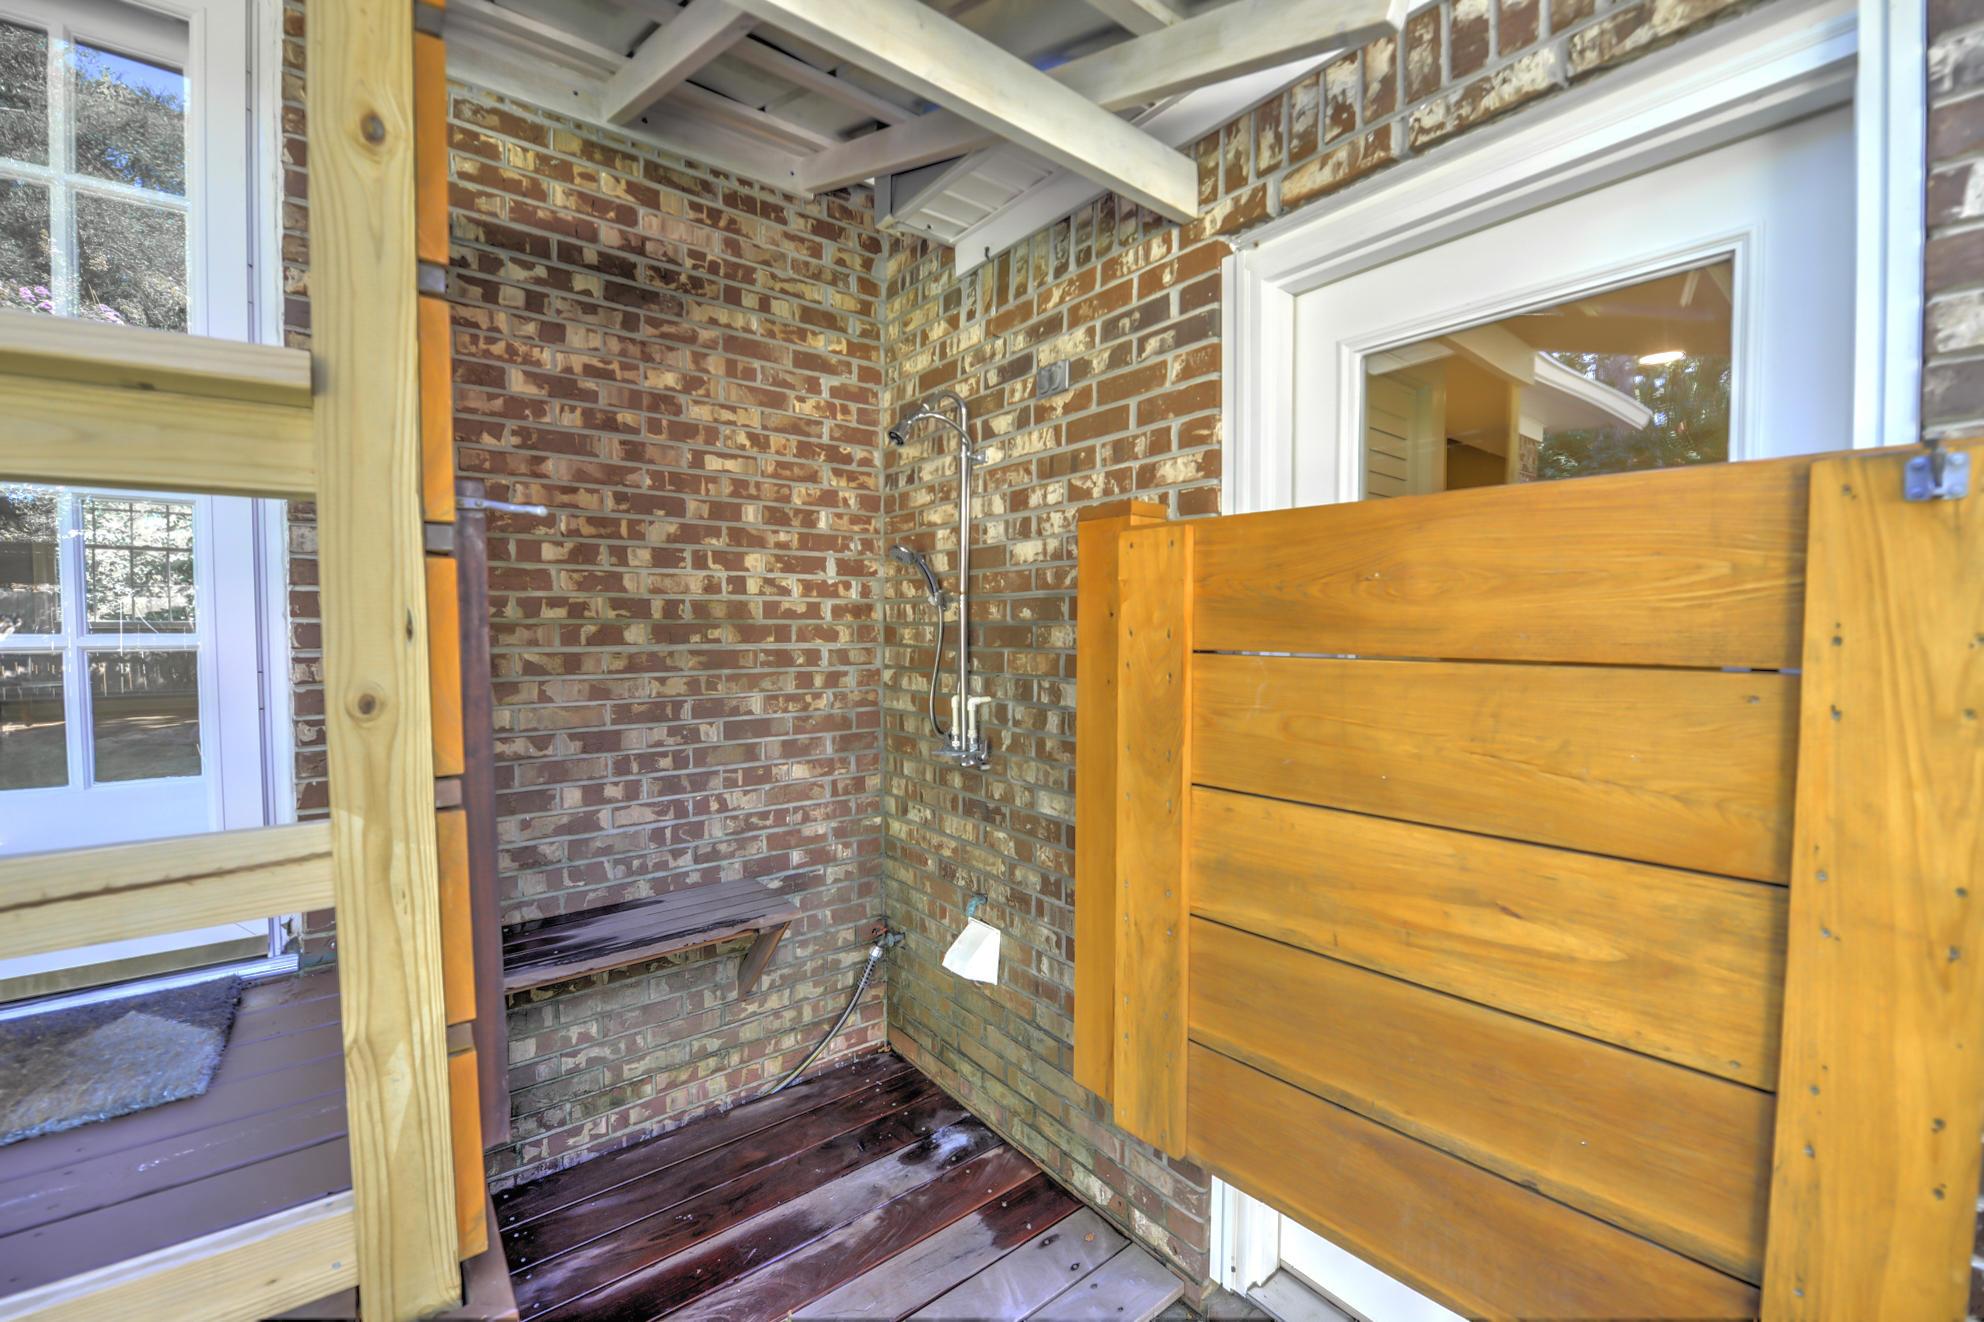 Shemwood II Homes For Sale - 1017 Jack Snipe, Mount Pleasant, SC - 31